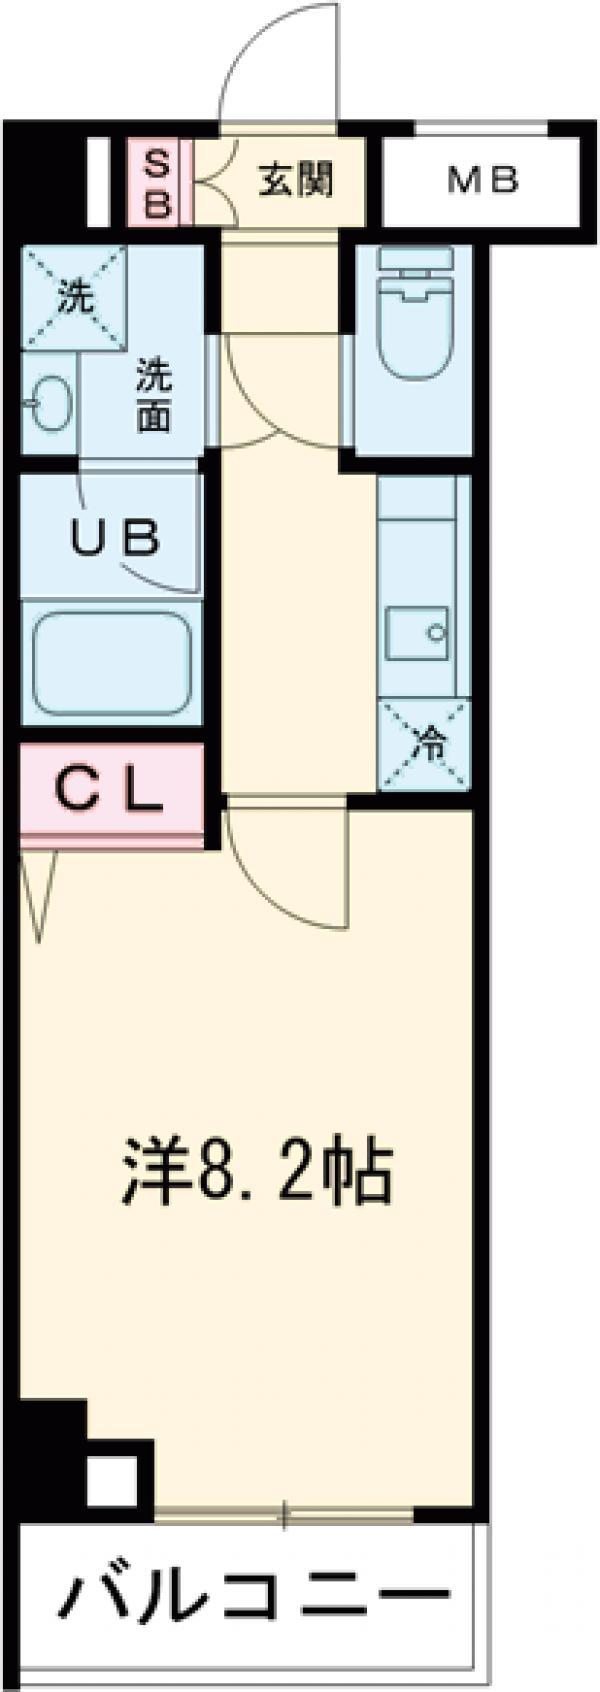 GENOVIA西高島平skygarden・306号室の間取り